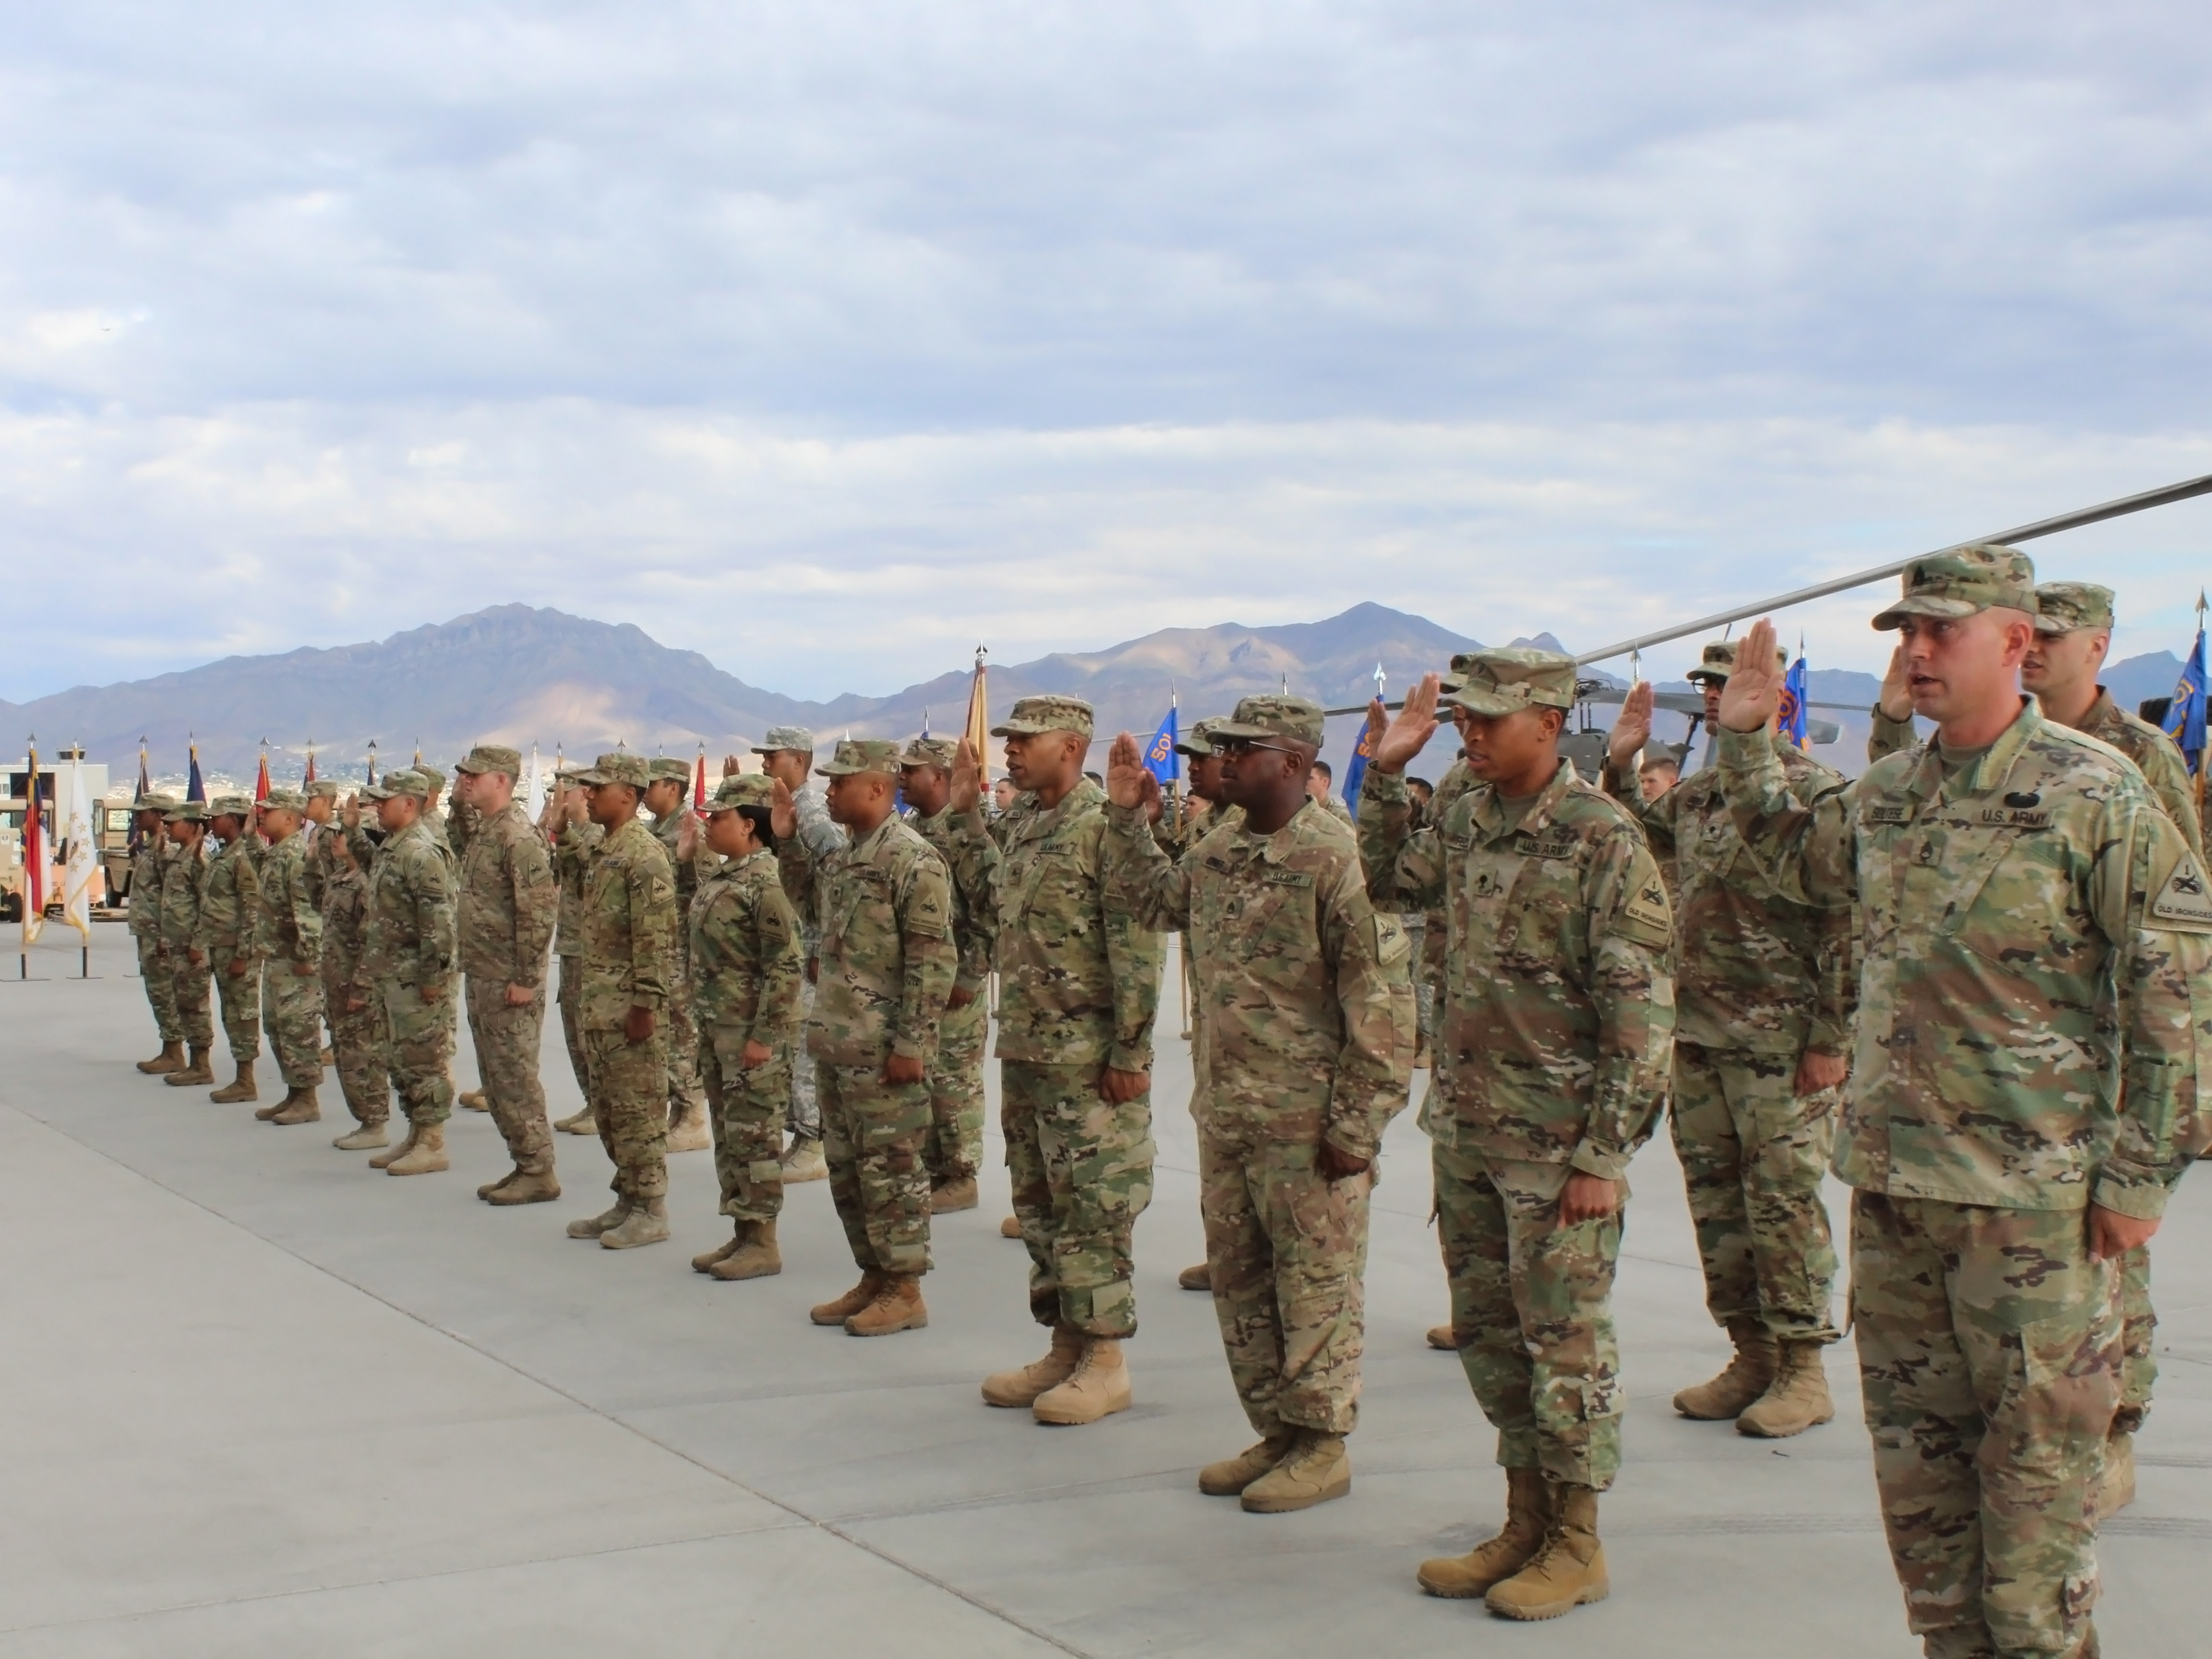 Oath in army photo